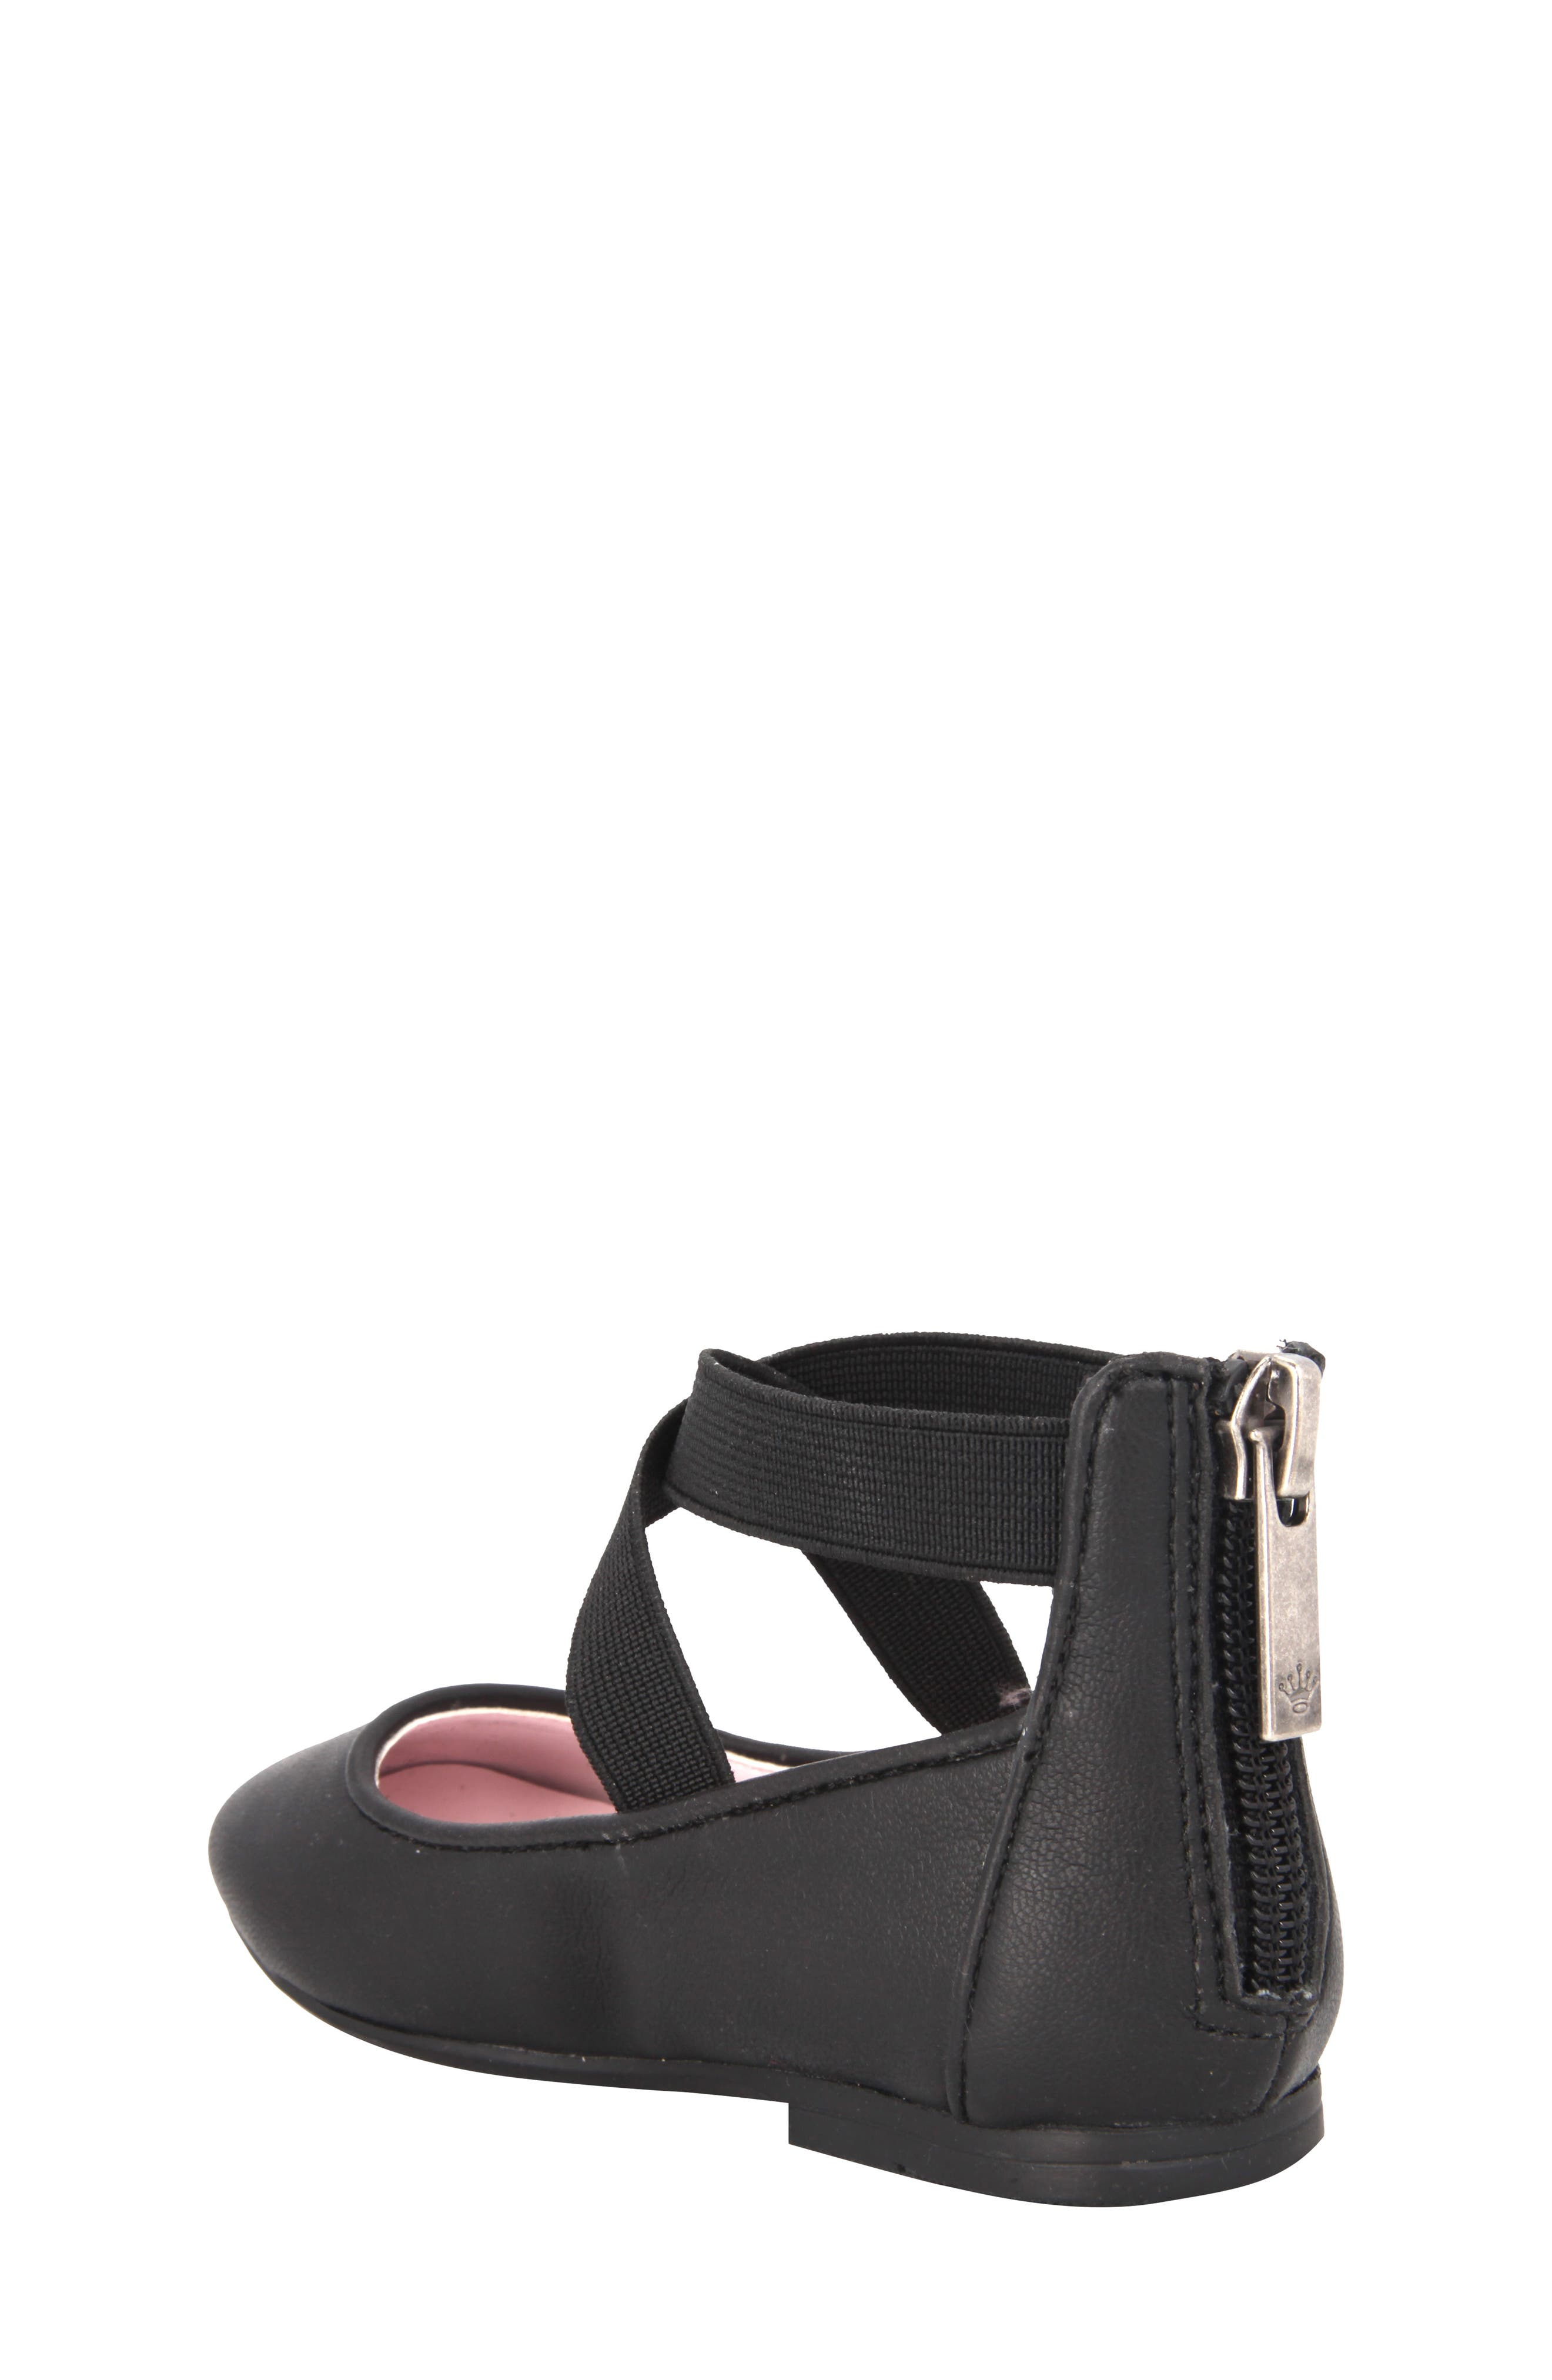 Marissa Cross Strap Flat,                             Alternate thumbnail 2, color,                             Black Faux Leather